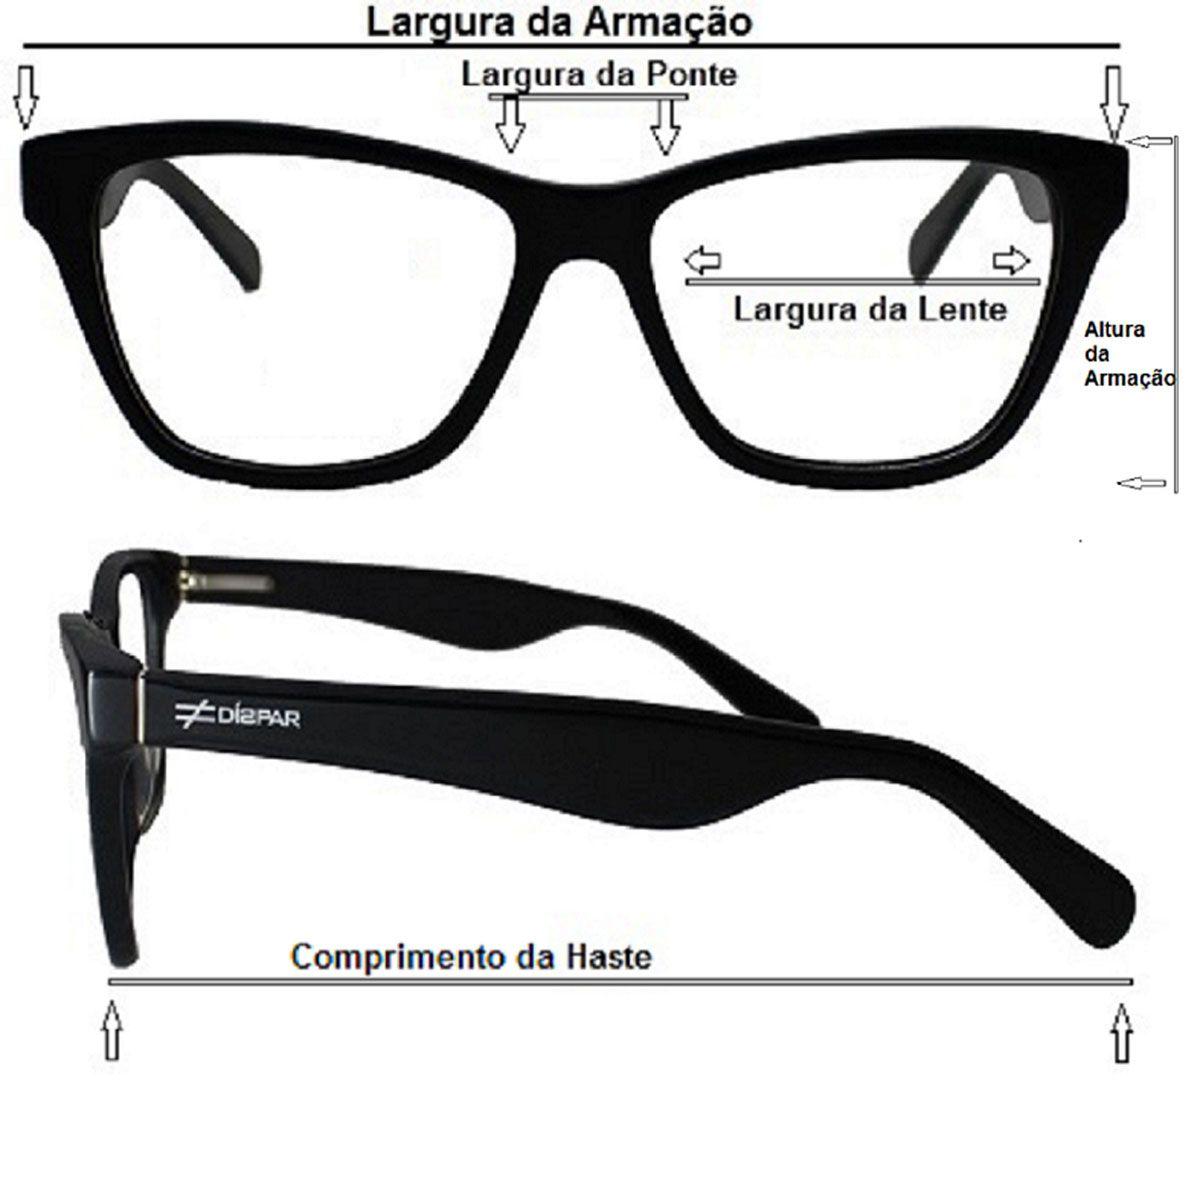 Óculos de Sol Díspar ID1894 infantil -  Rosê